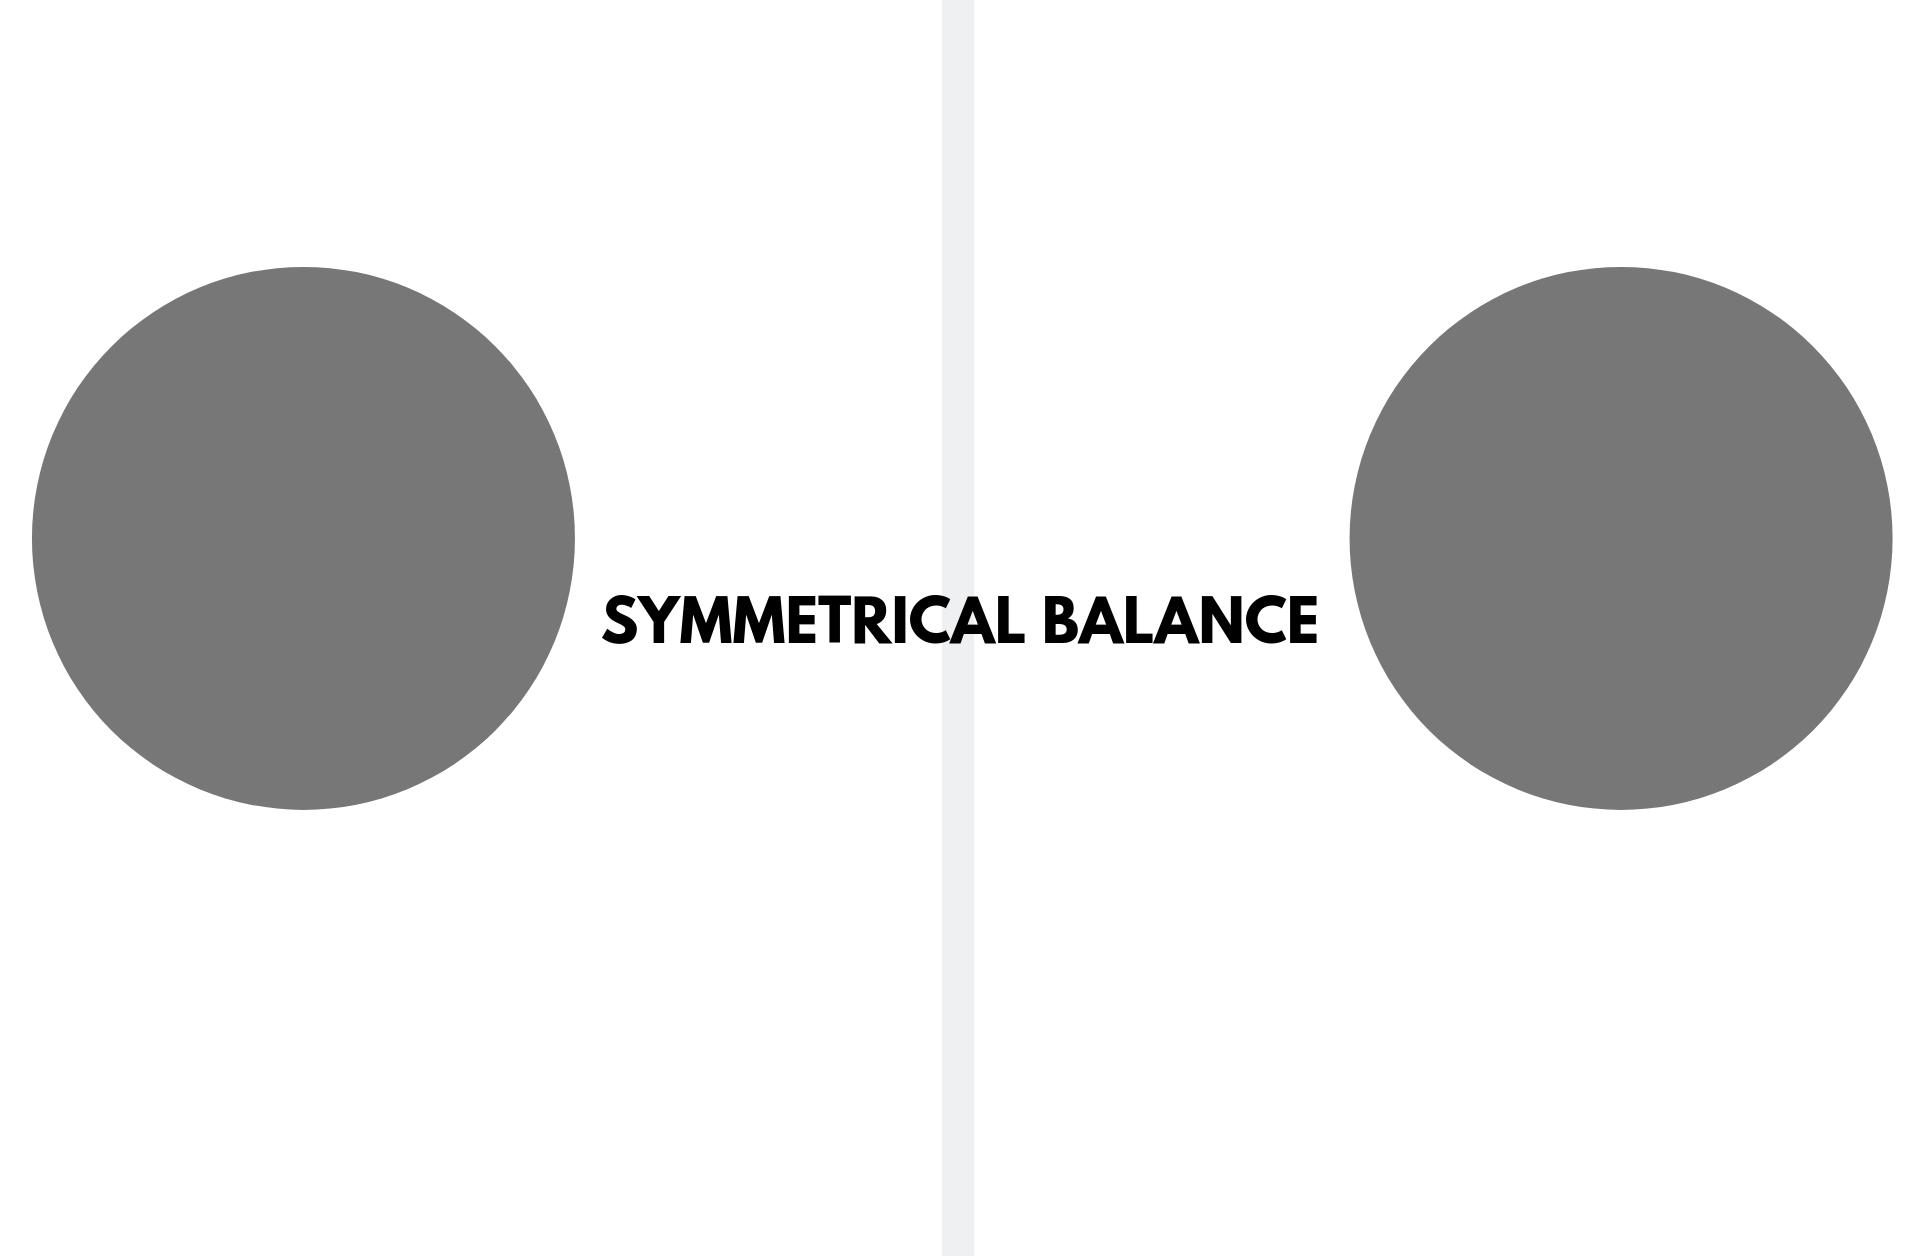 Symmetrical Balance In Graphic Design Graphic Design Careers Symmetrical Balance Graphic Design